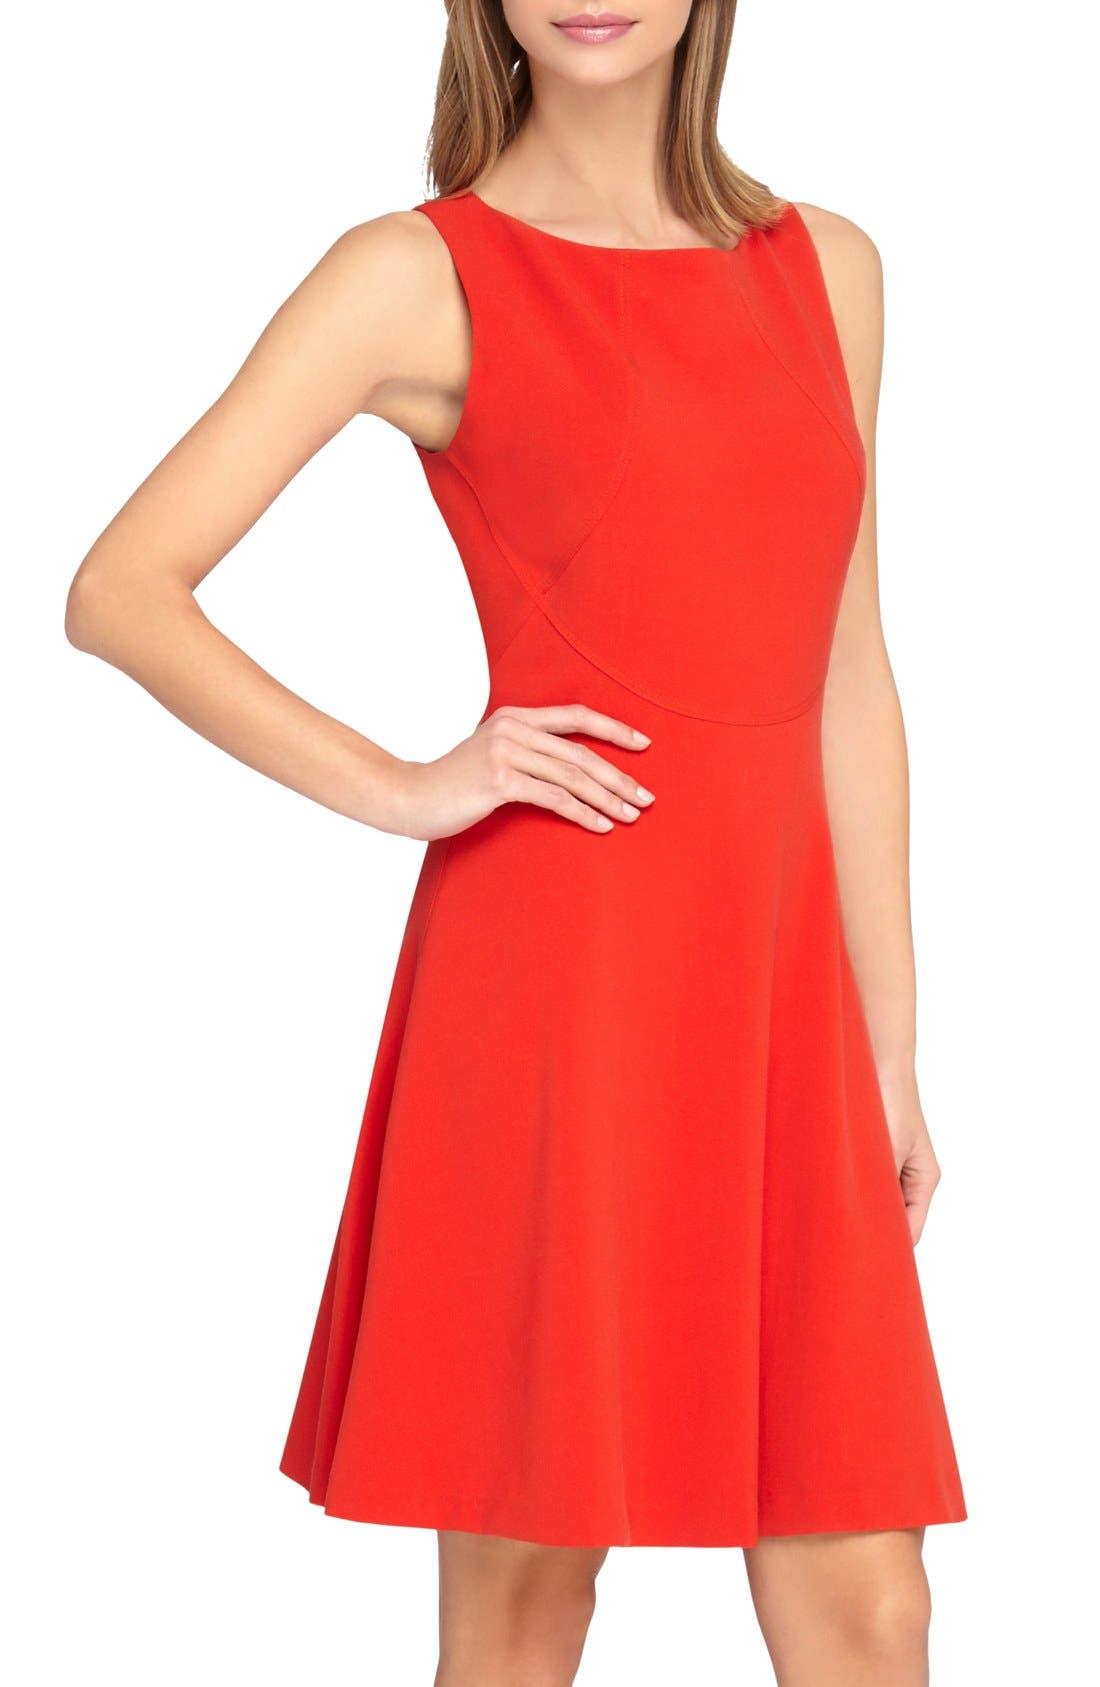 Alternate Image 1 Selected - Tahari Seamed Knit Fit & Flare Dress